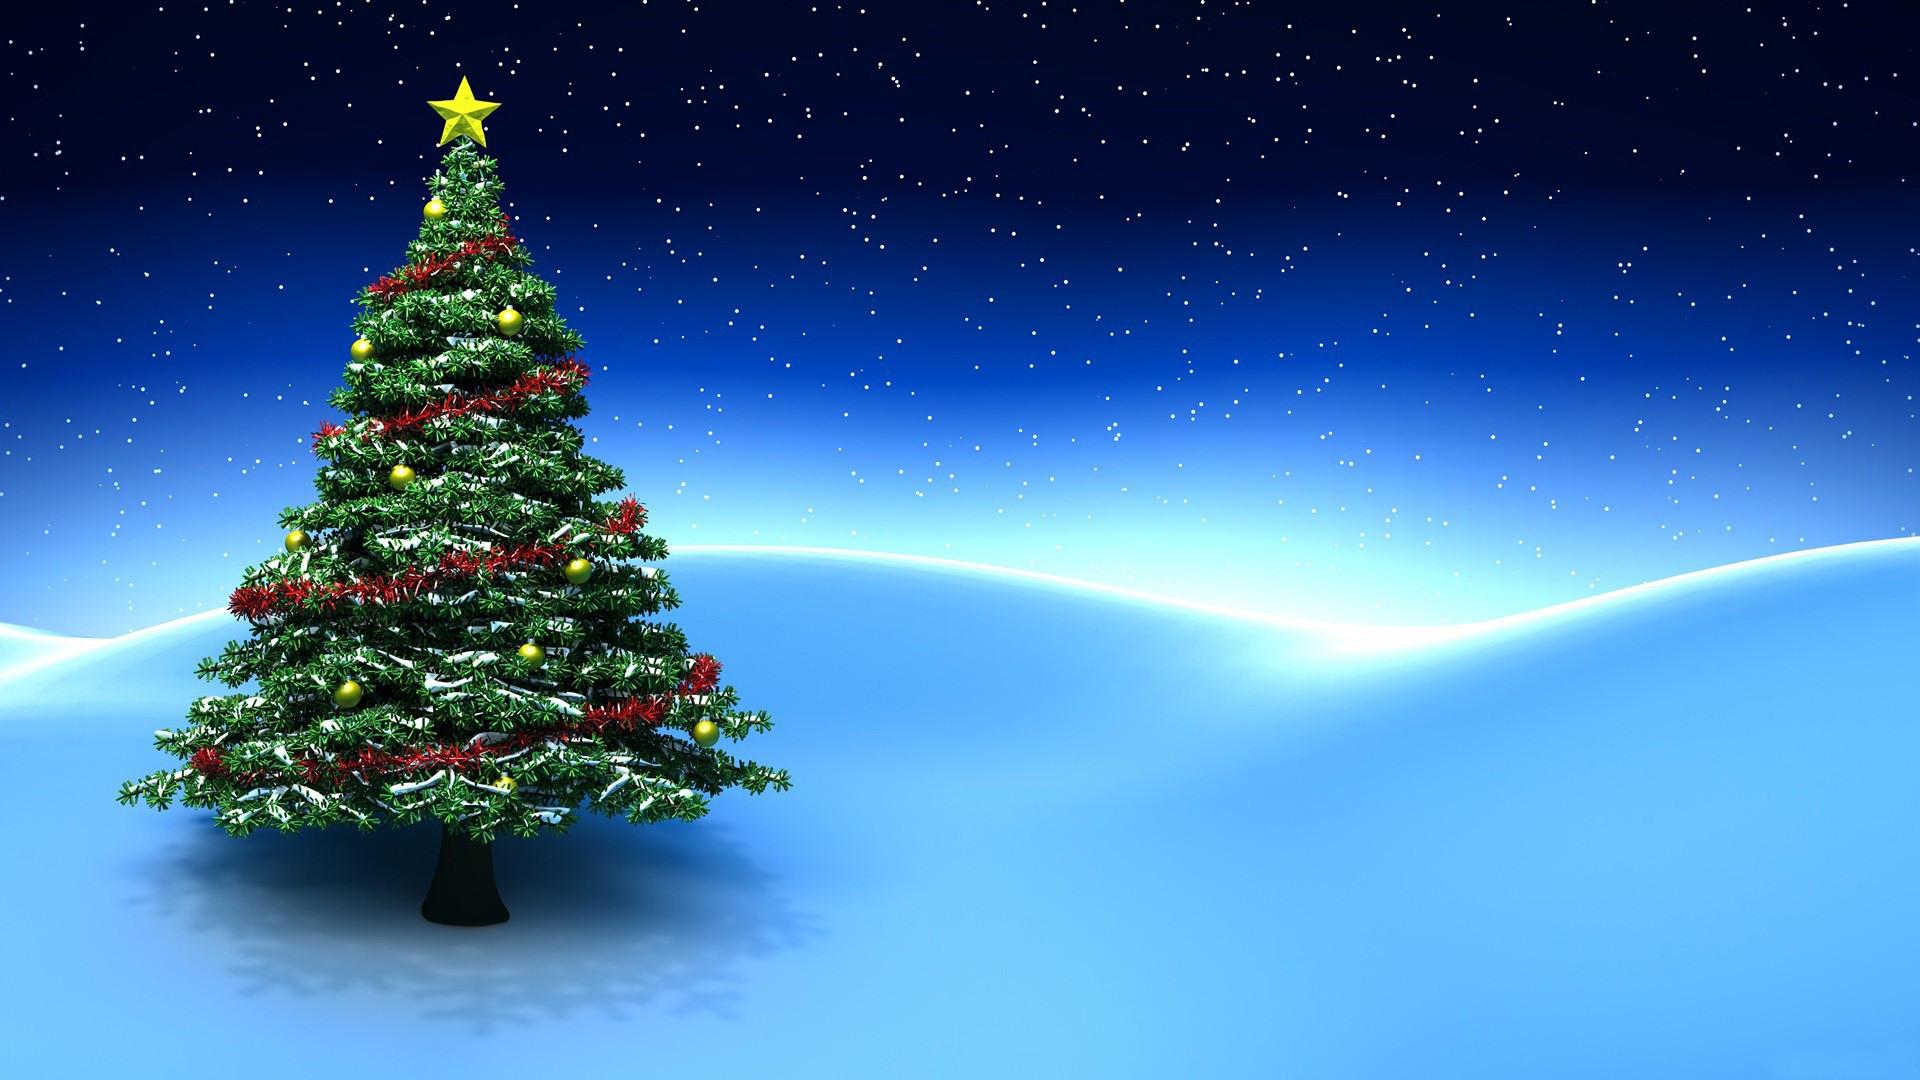 Blue Christmas Tree Background (13)